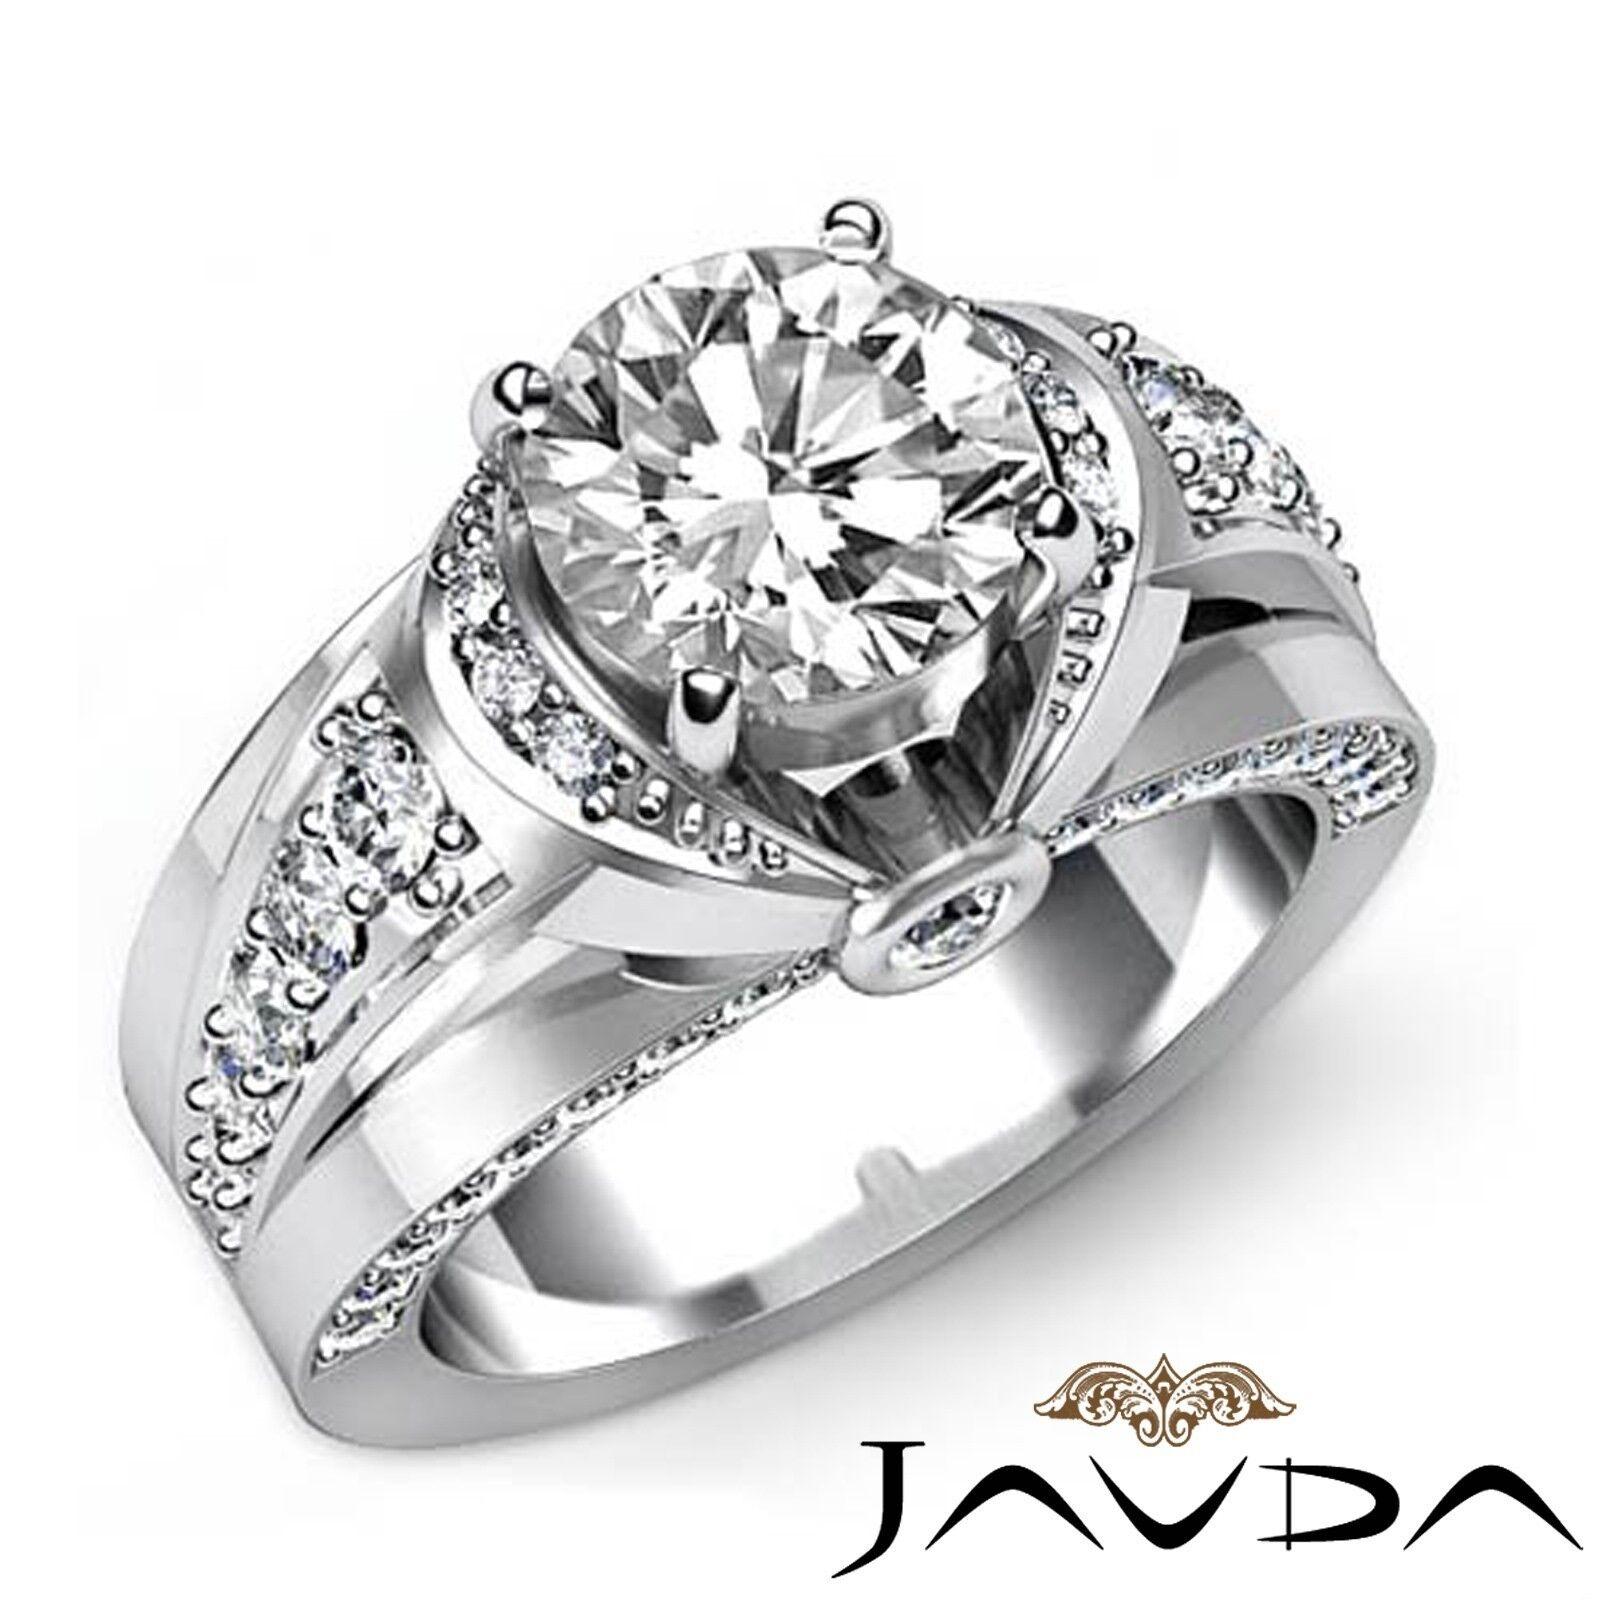 2.65ct Knot Classic Sidestone Round Diamond Engagement Ring GIA I-SI1 White Gold